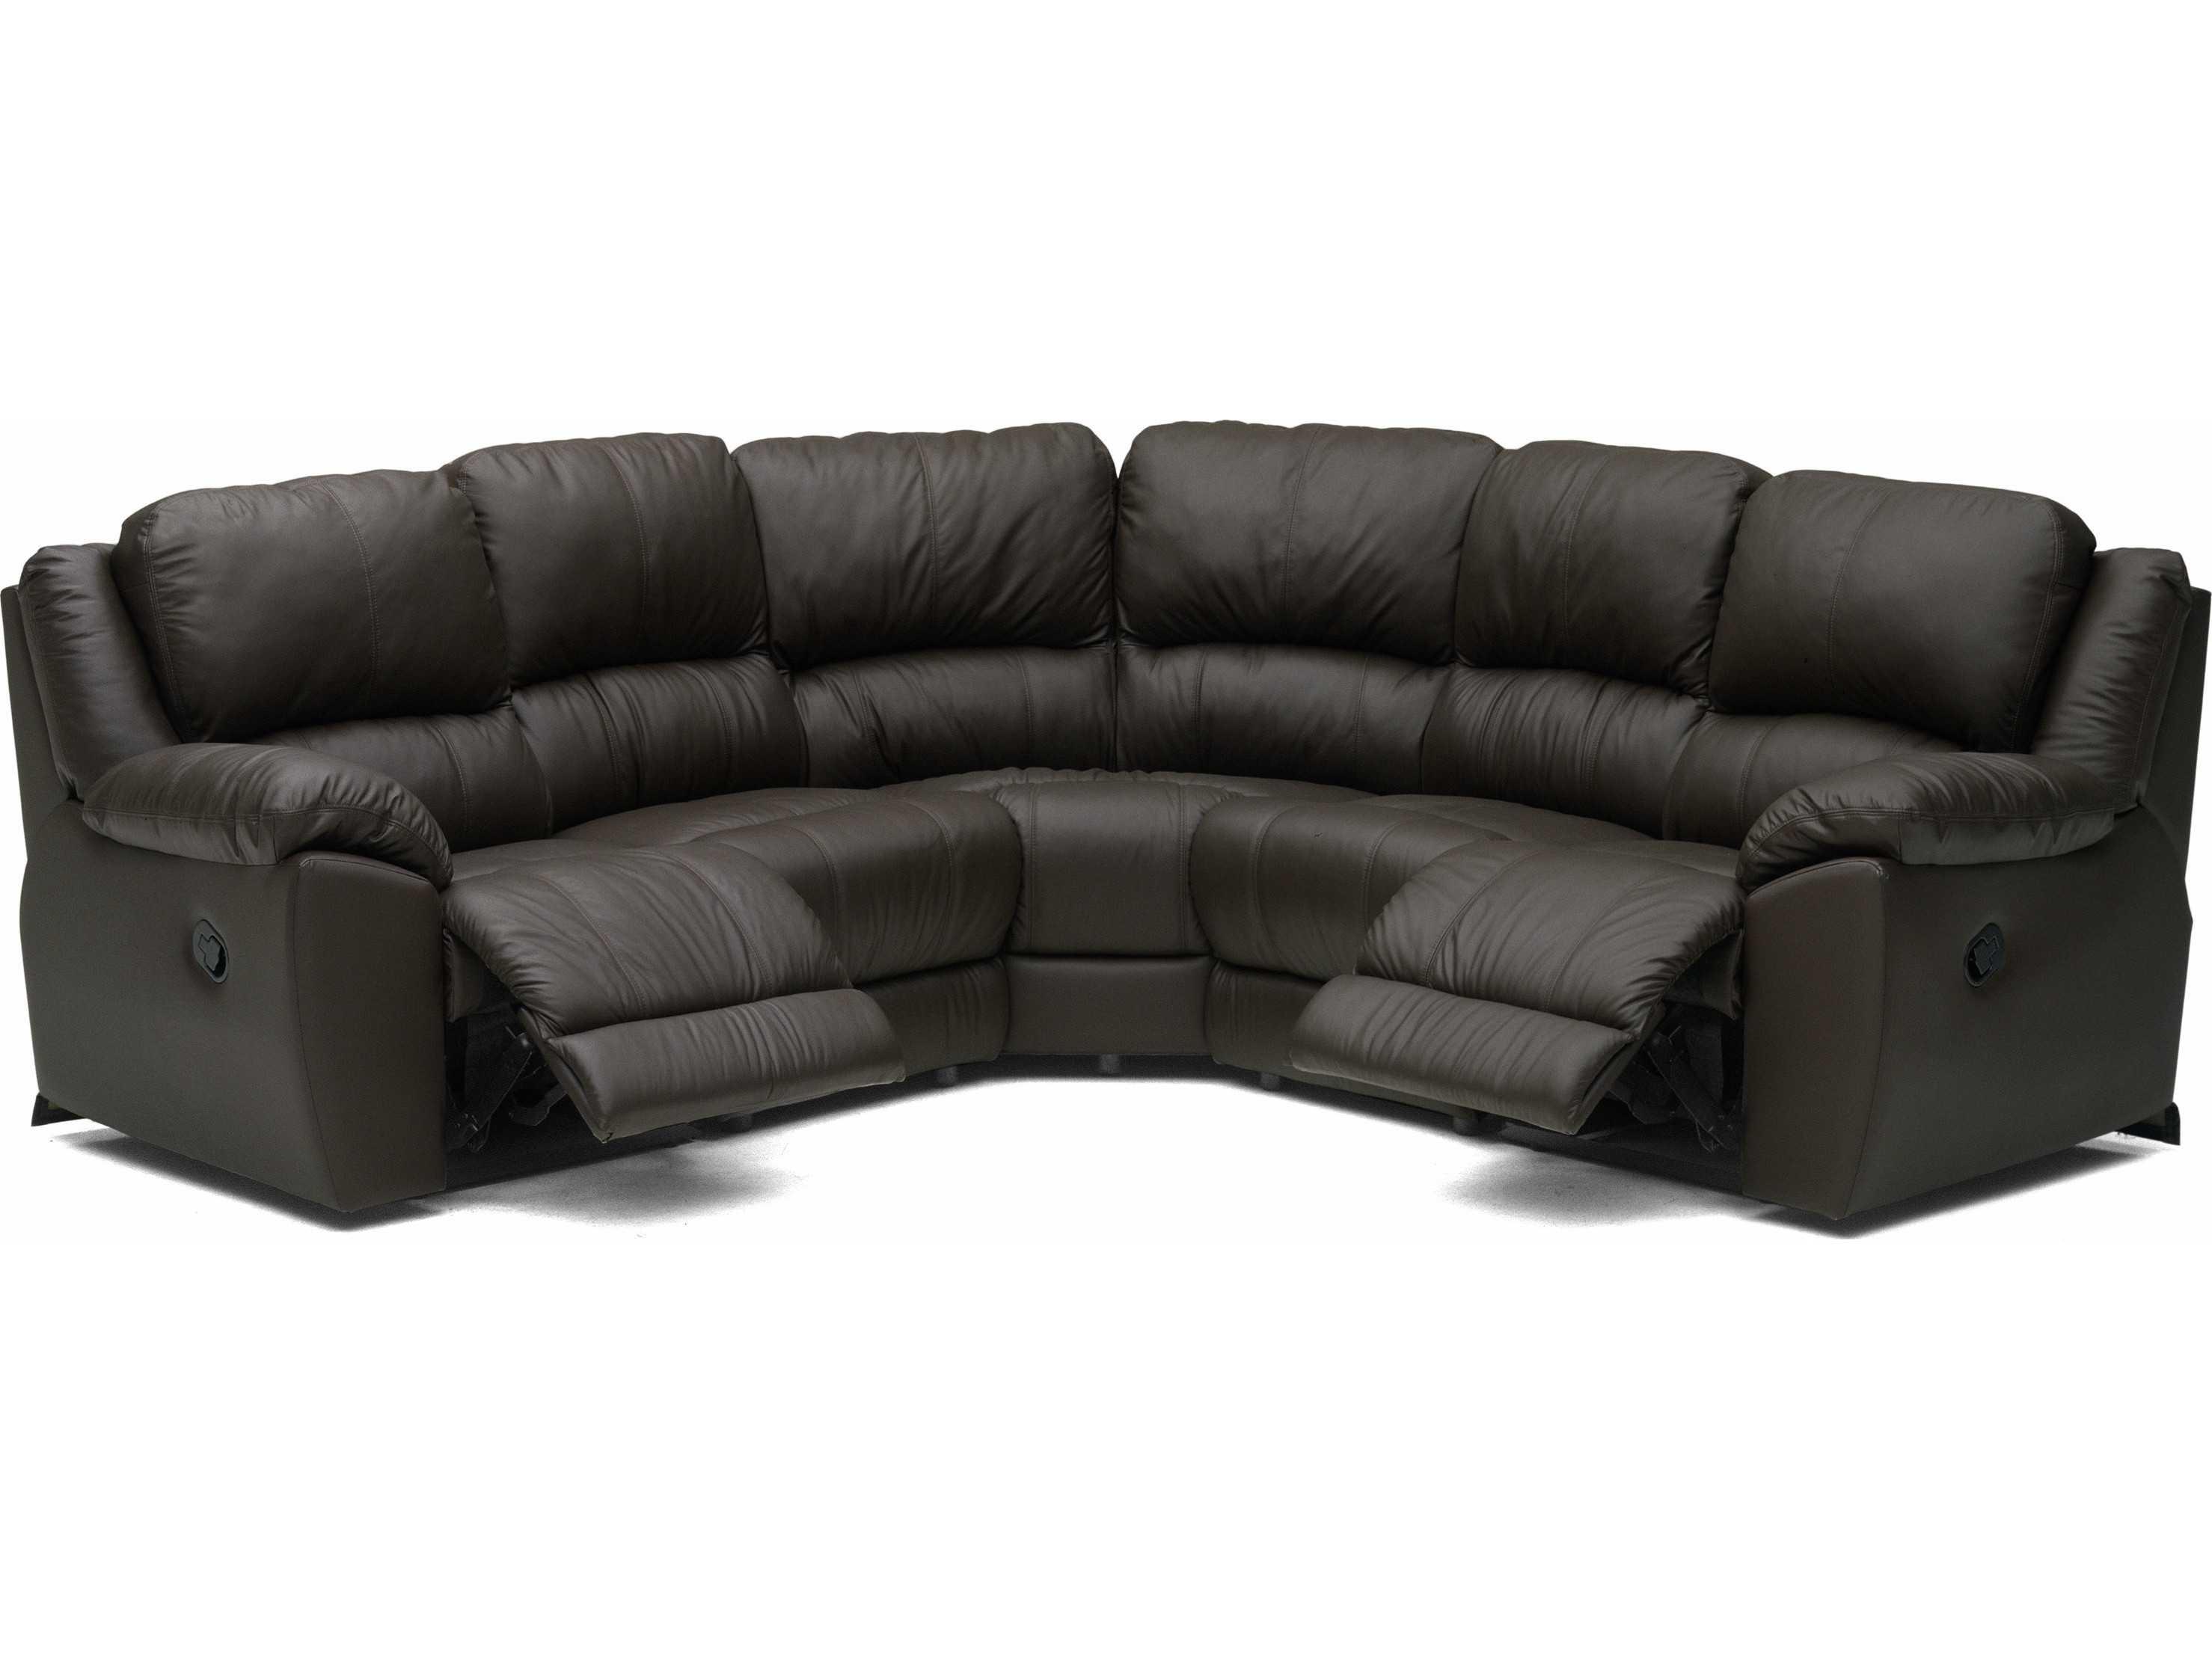 palliser furniture benson sectional sofa casual plmo1